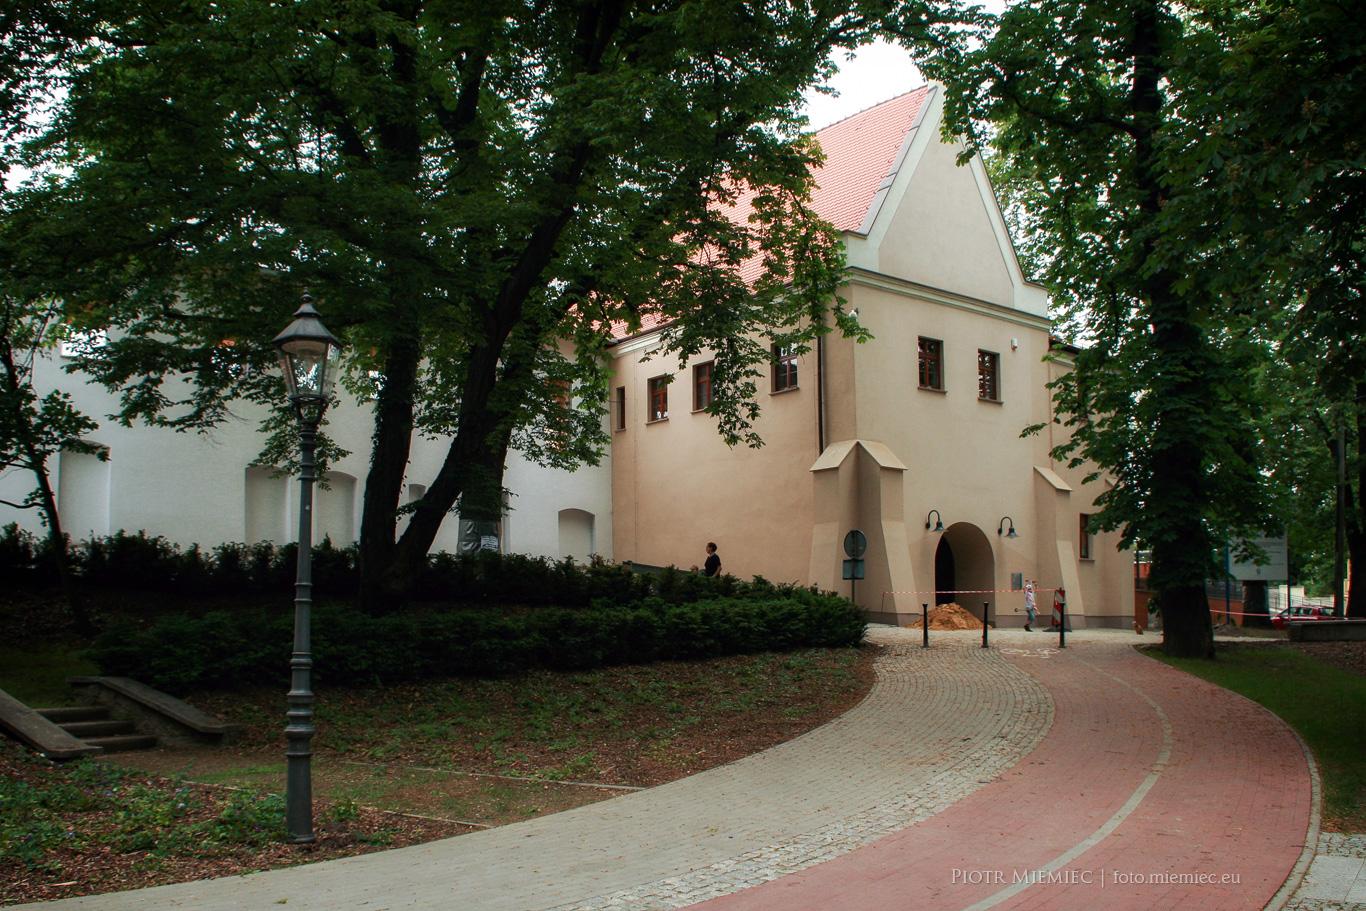 Zamek w Raciborzu – VI 2012